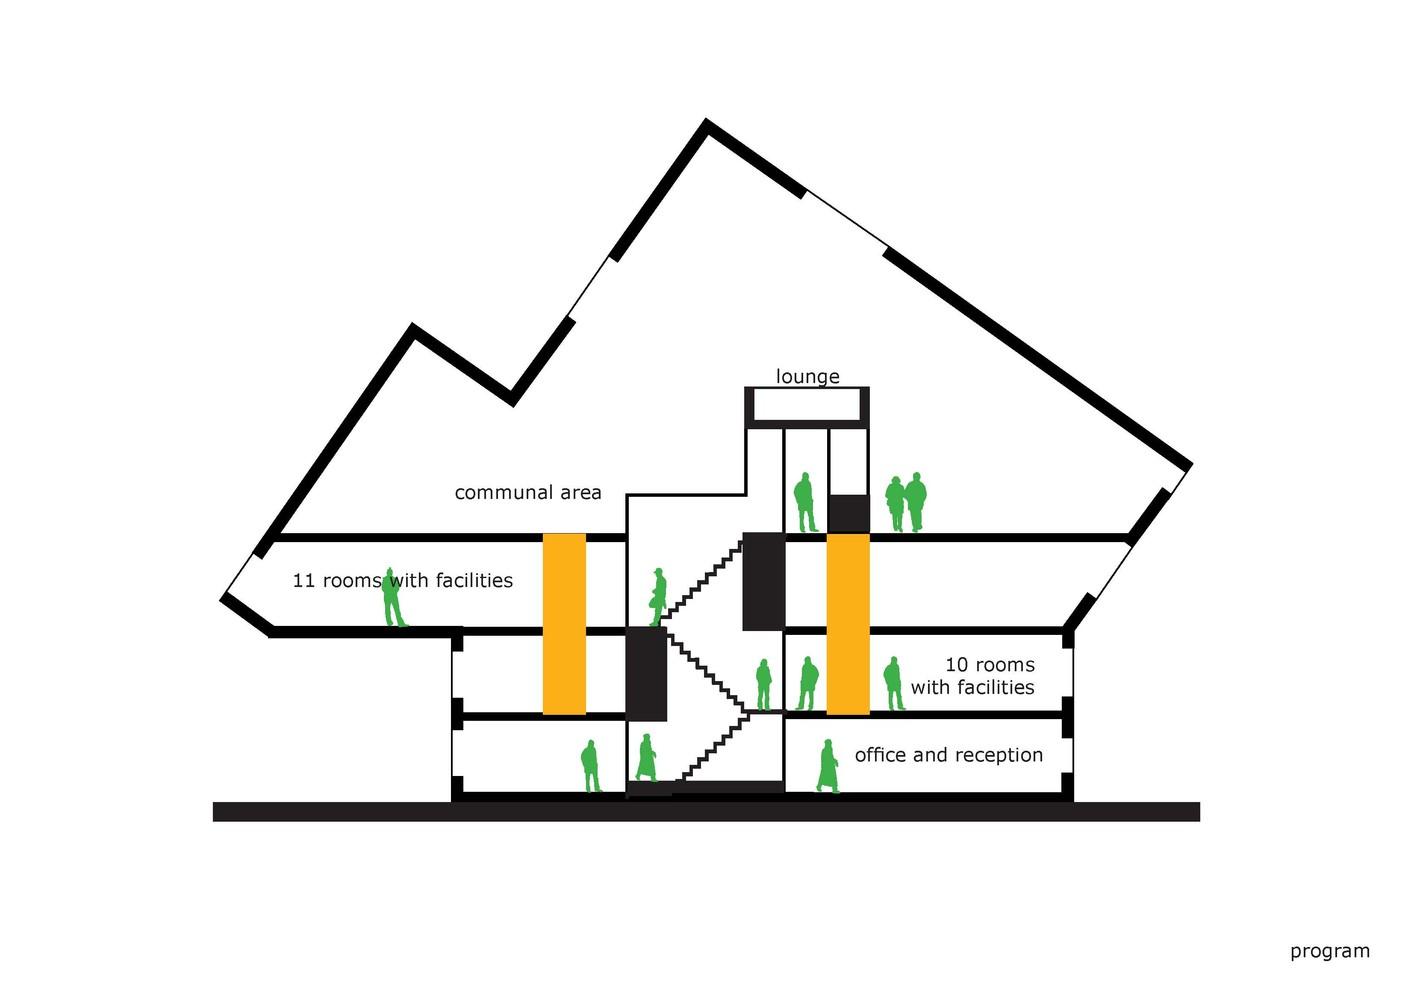 Small Bathroom Renovation Ideas. Image Result For Small Bathroom Renovation Ideas